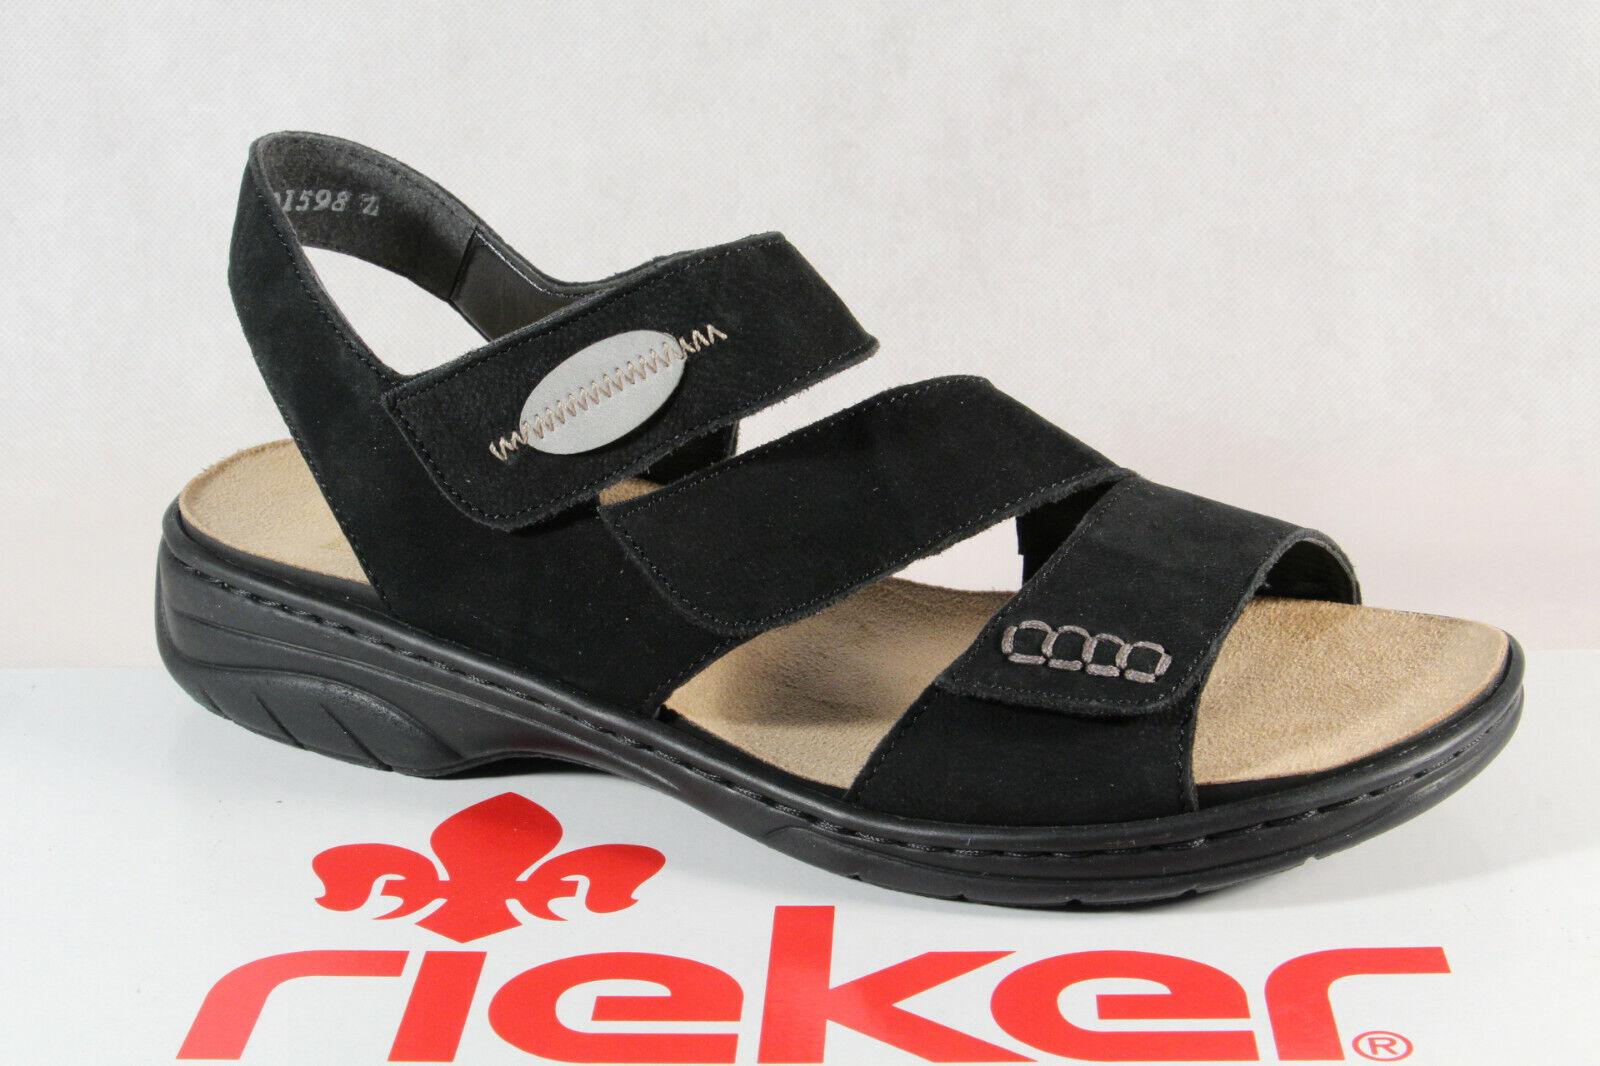 Rieker Damen Sandalen Sandaletten Sandale schwarz Echteder 64573 NEU